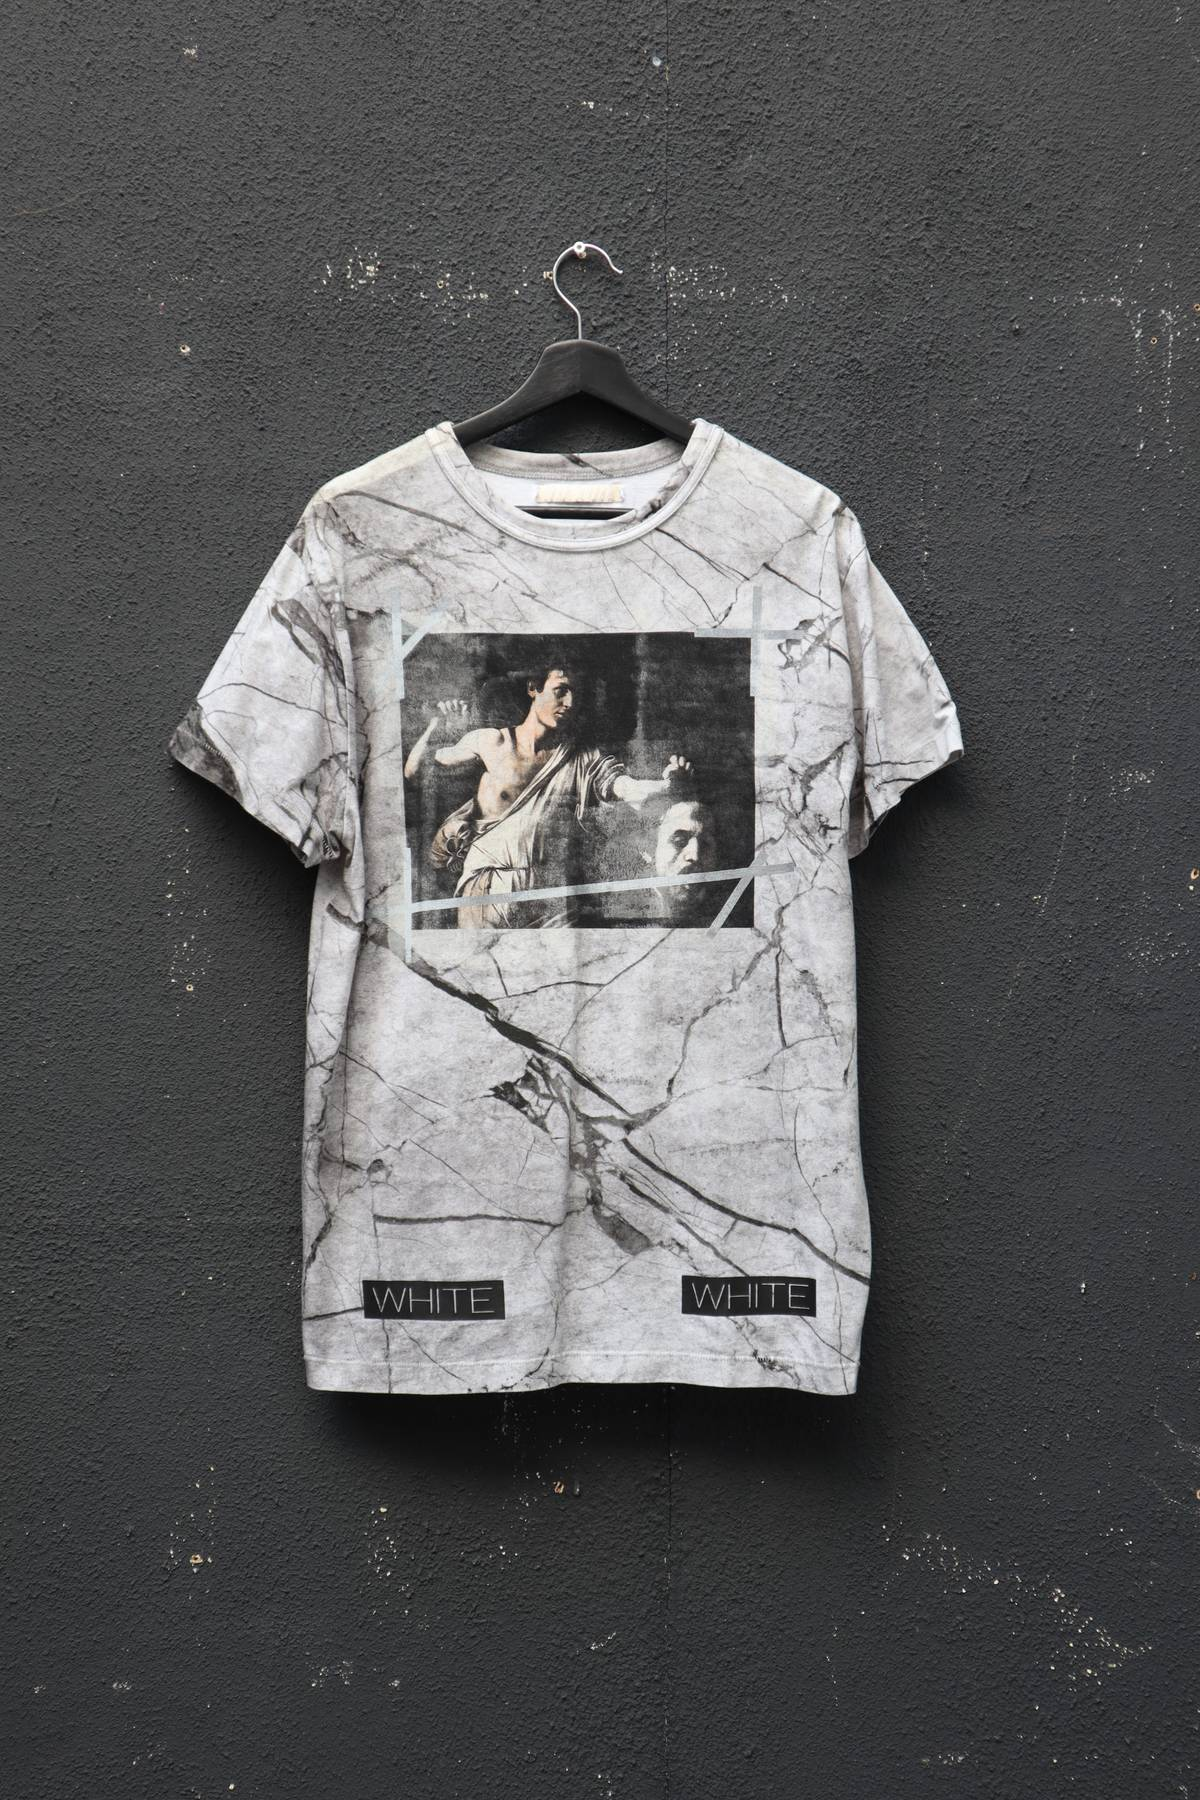 c141870efb Off White Black Marble T Shirt – DACC